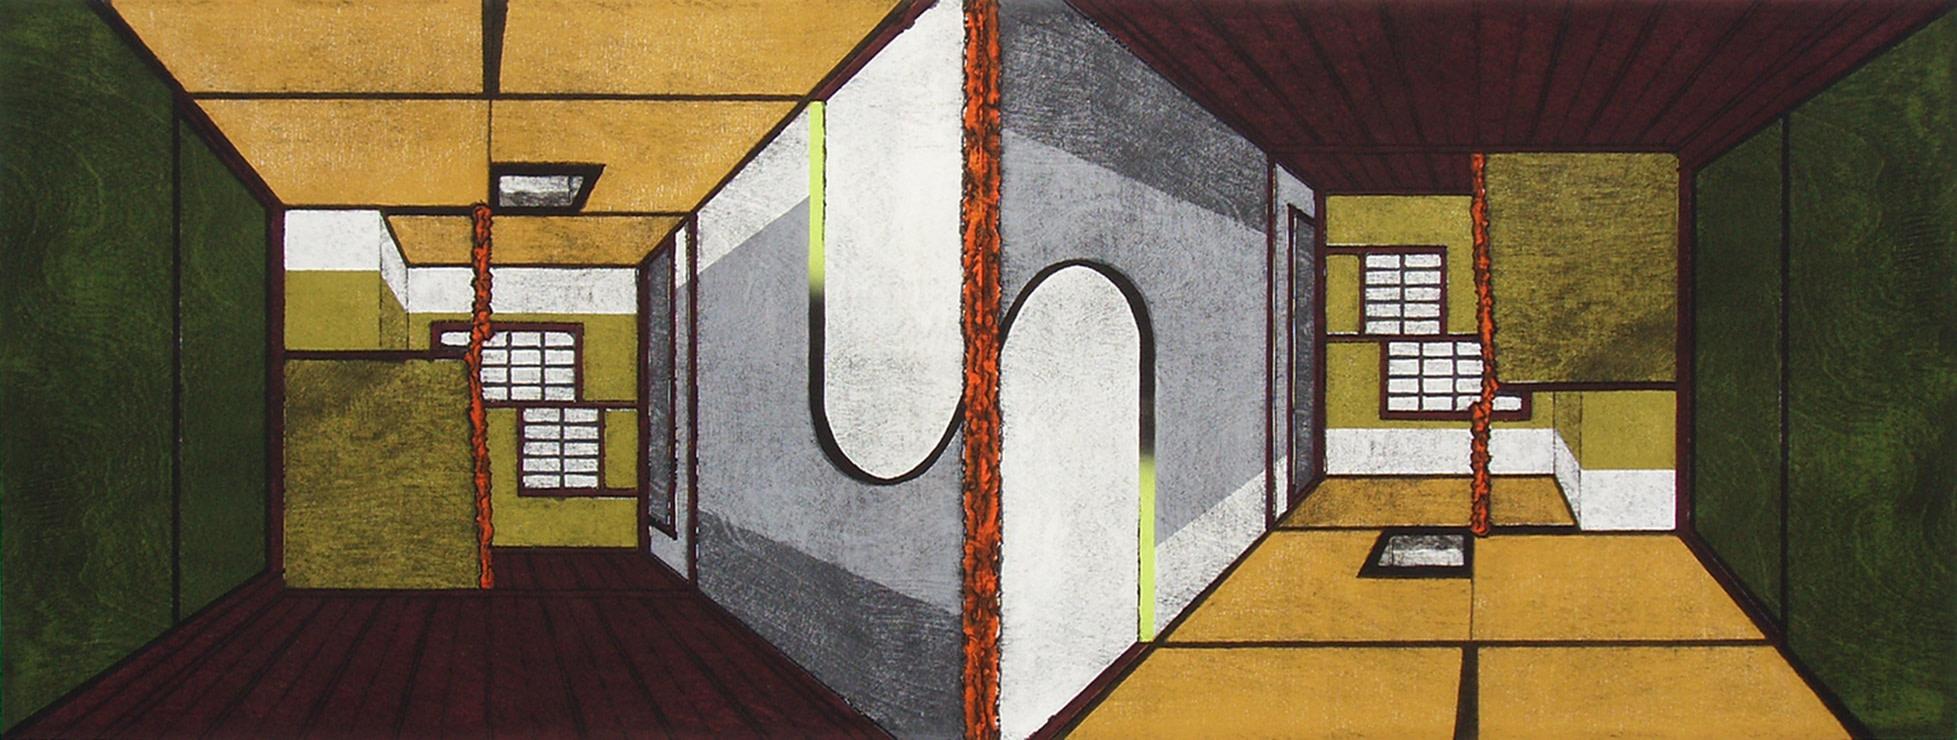 <span class=&#34;link fancybox-details-link&#34;><a href=&#34;/artists/114-nana-shiomi-re/works/9517/&#34;>View Detail Page</a></span><div class=&#34;artist&#34;><span class=&#34;artist&#34;><strong>Nana Shiomi RE</strong></span></div><div class=&#34;title&#34;><em>Reverse Universe - Chashitsu</em></div><div class=&#34;medium&#34;>woodcut</div>